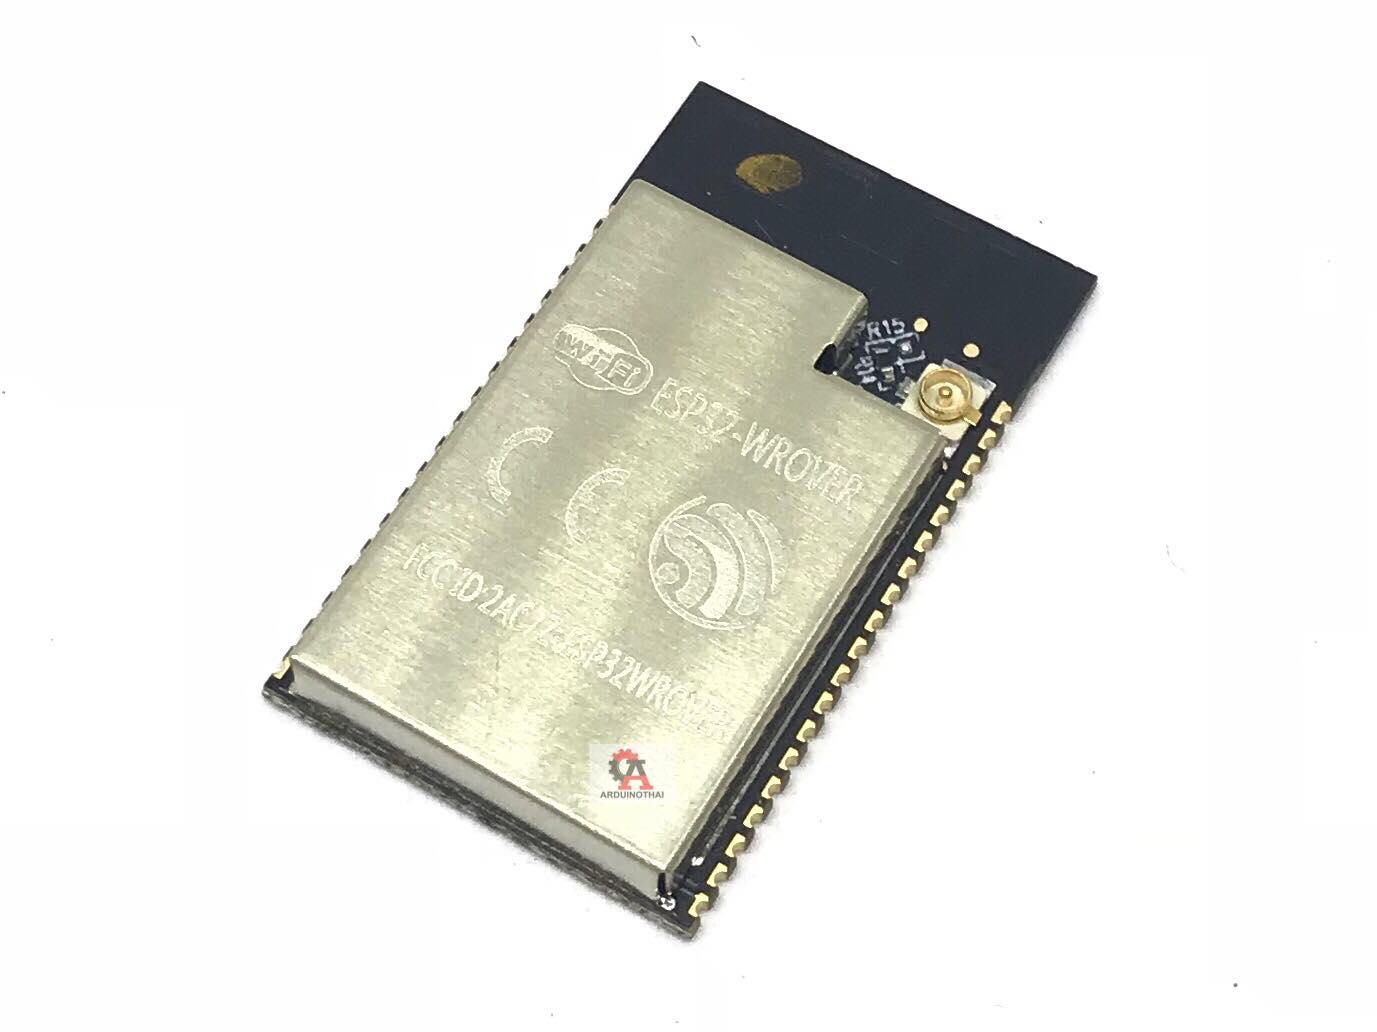 ESP32 WROVER module PCB and IPEX version